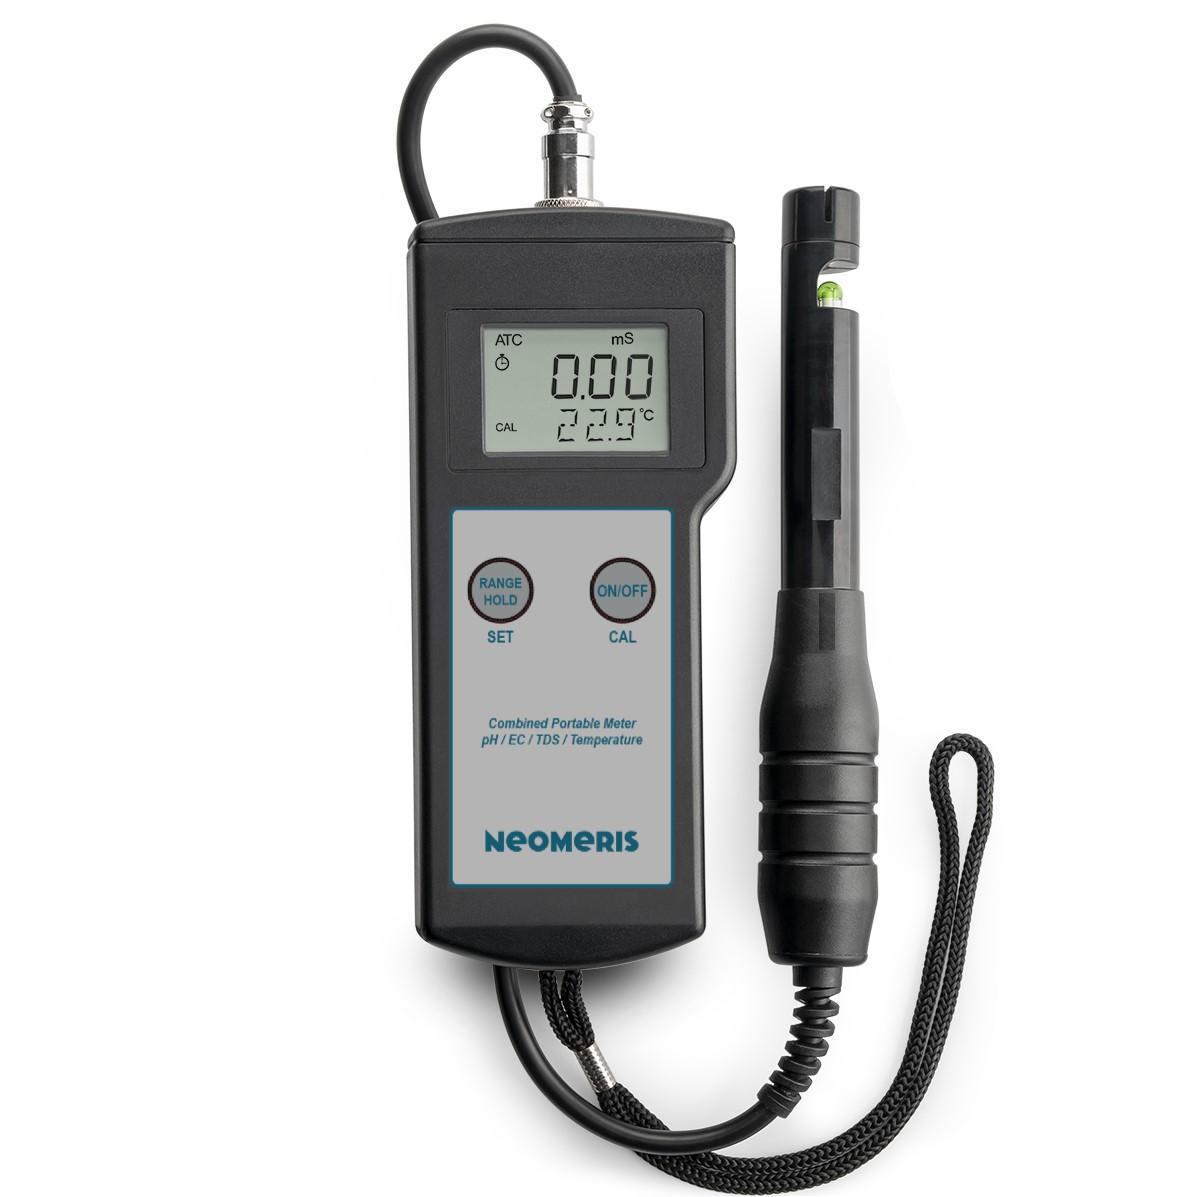 Neomeris Kombitestgerät pH/EC/TDS/Temperatur High Range